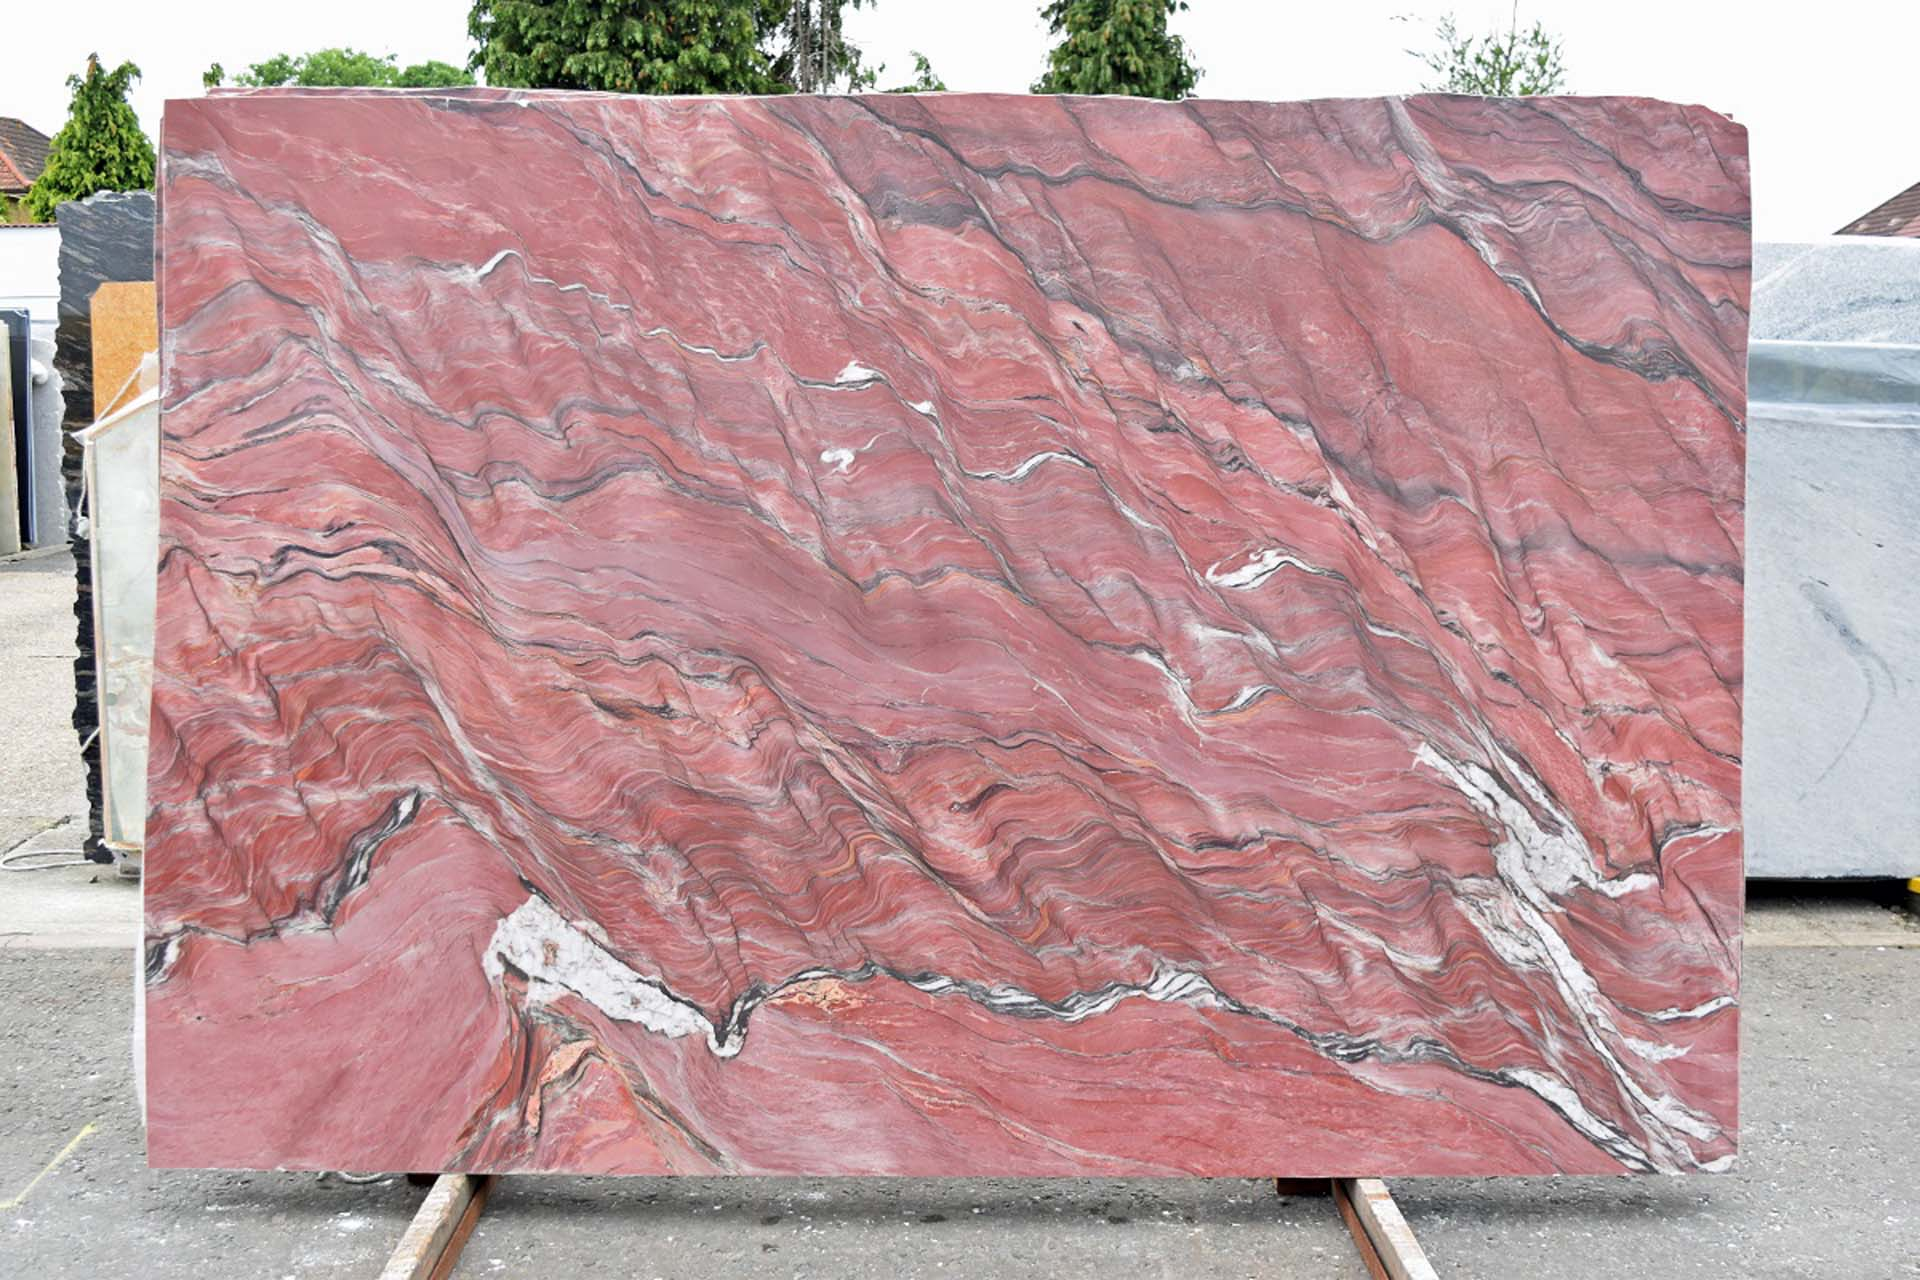 Fusion Fire (Polished) Block 526 – 3CM granite worktops Gerald Culliford